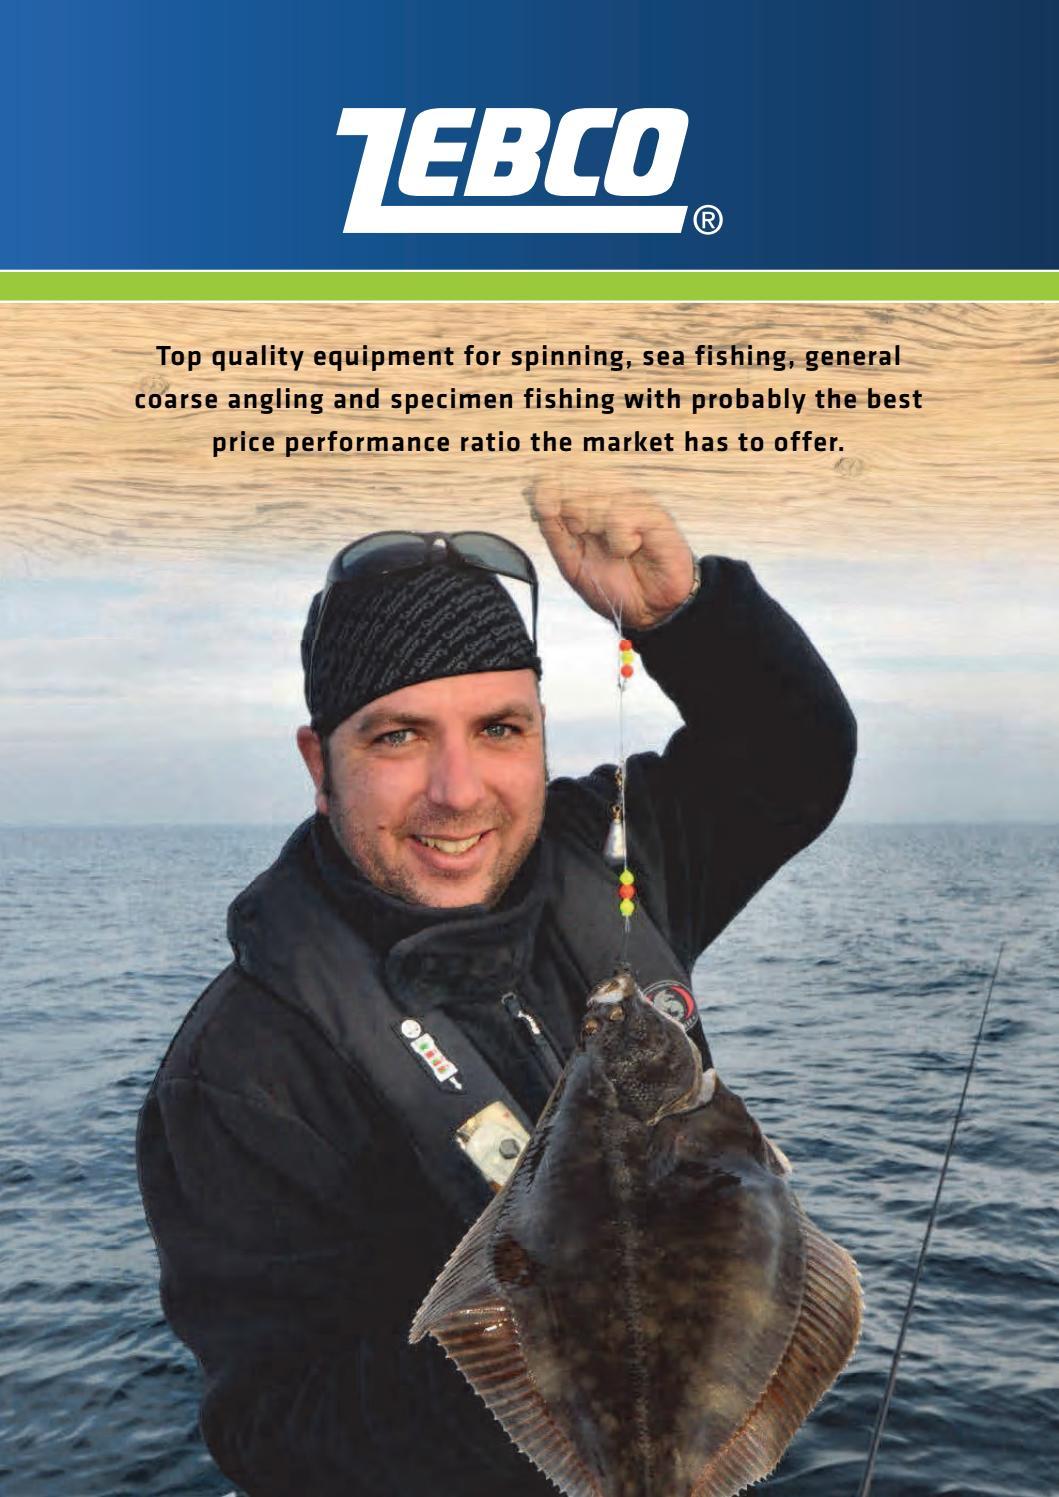 Zebco Forcep Tool 15cm Long Stainless Steel Fishing Coarse Predator 6401015